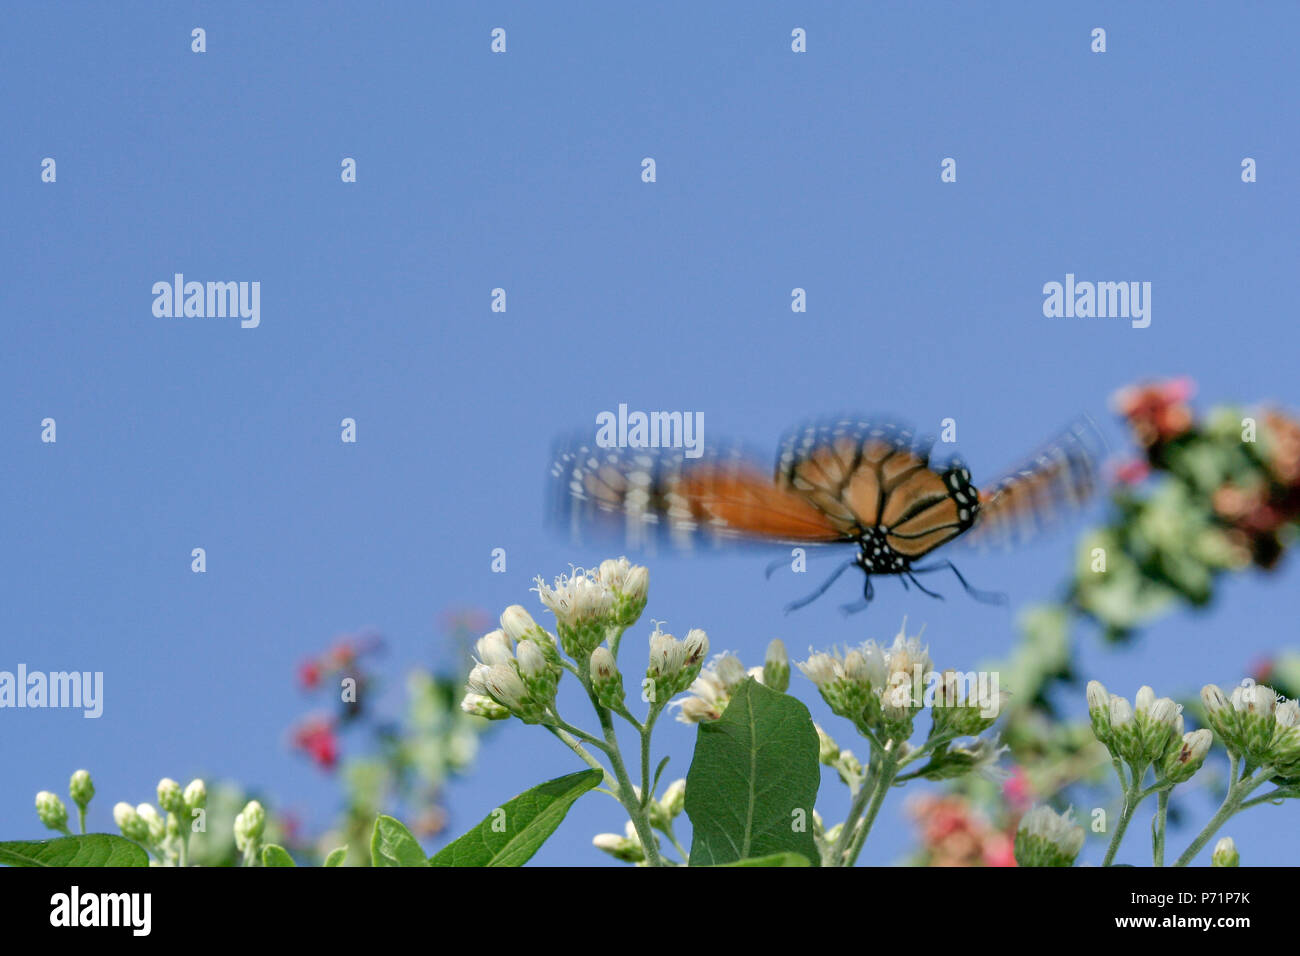 A southern monarch (Danaus erippus) butterfly flies over a bitterleaf tree (Gymnanthemum extensum) flowers, Asuncion, Paraguay Stock Photo